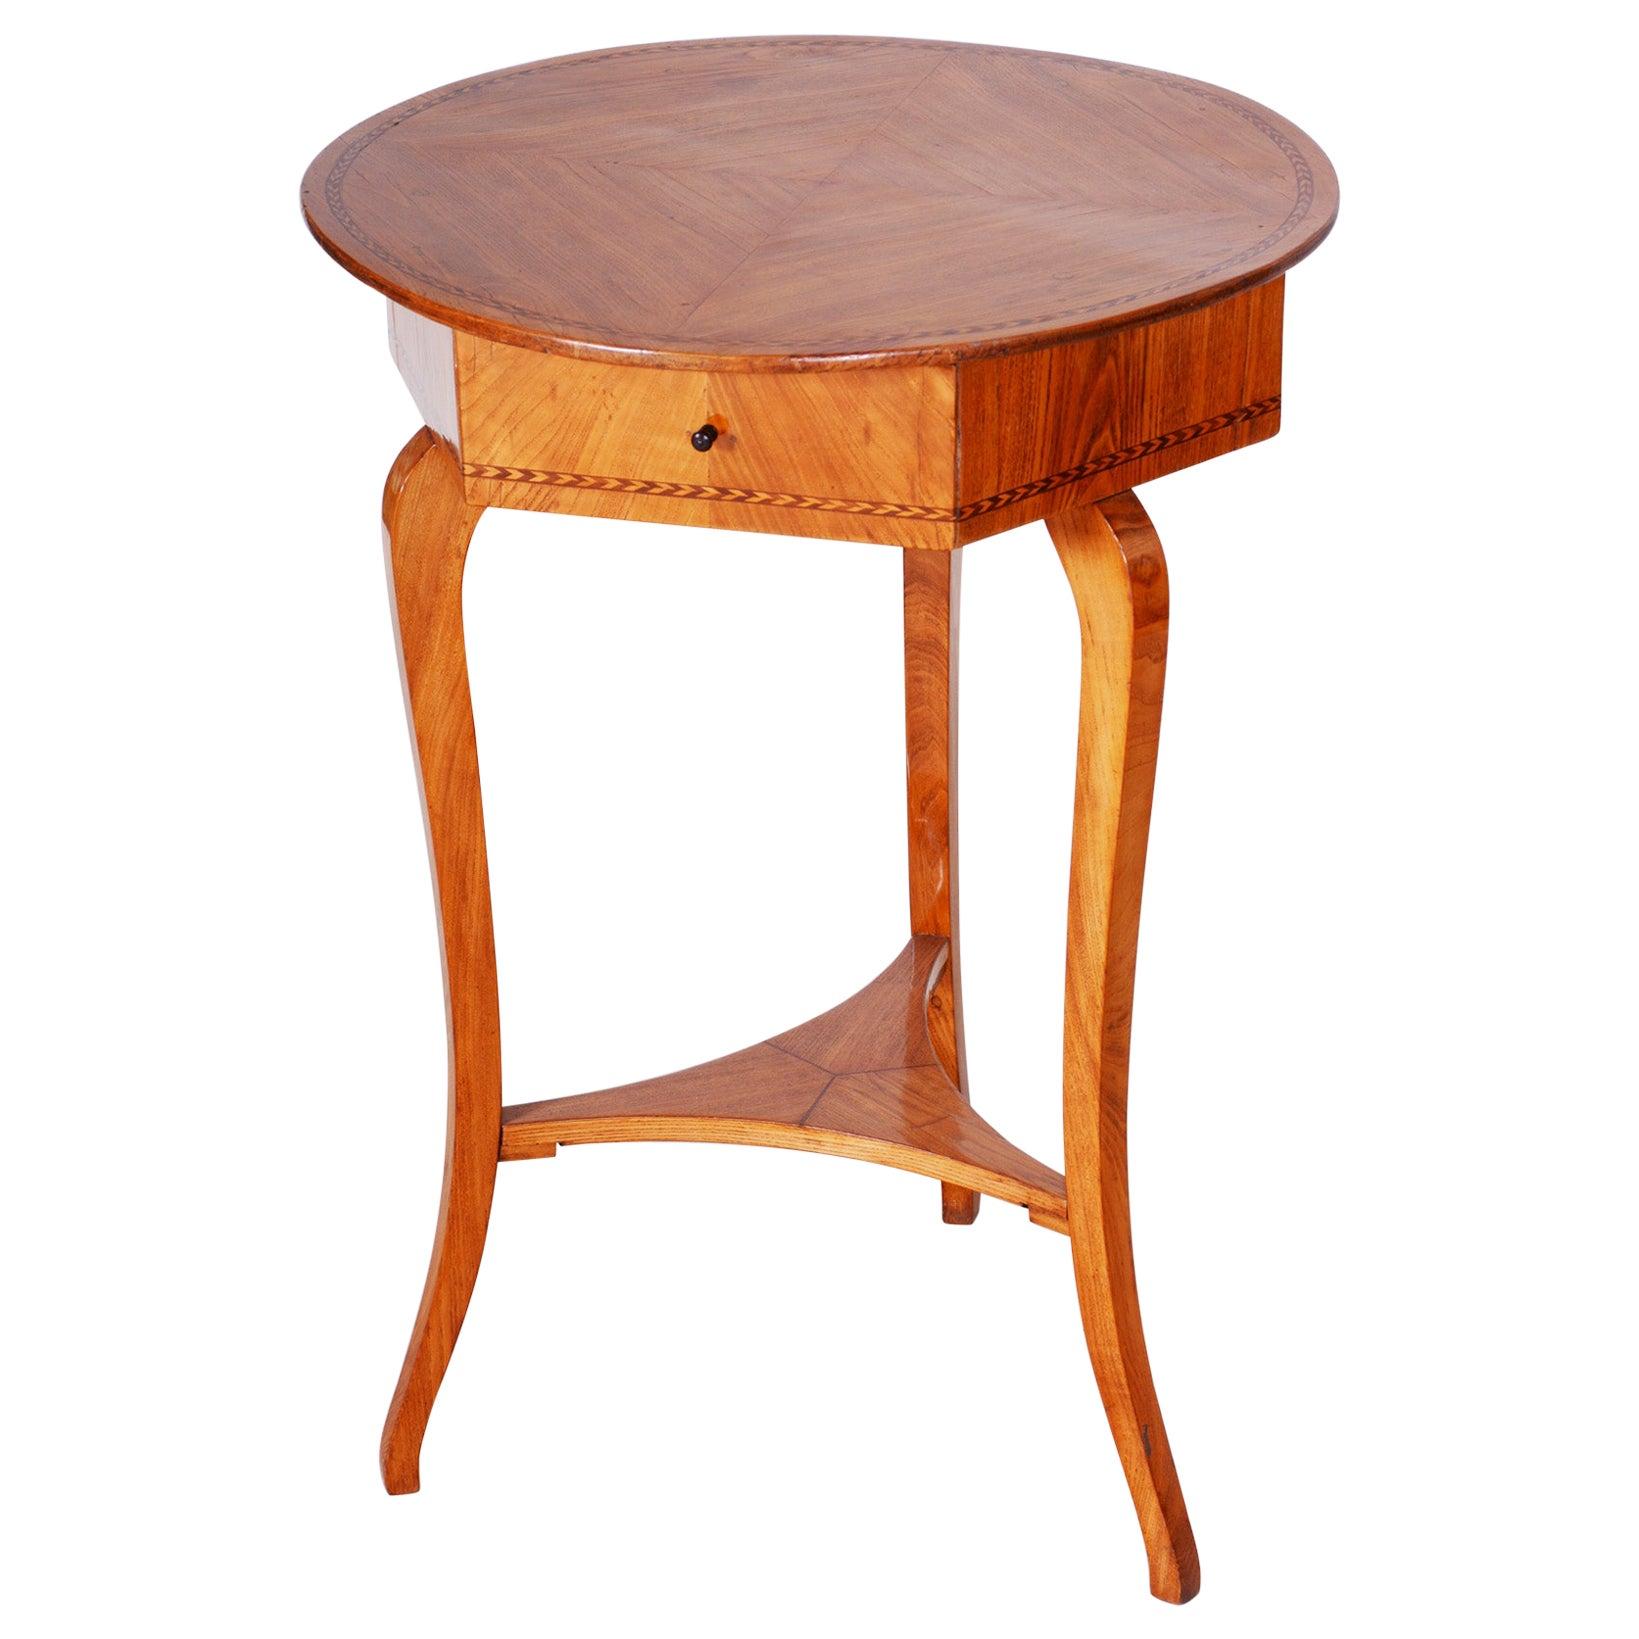 Small Brown Elm Biedermeier Side Round Table, Austria, 1780s, Shellac Polished